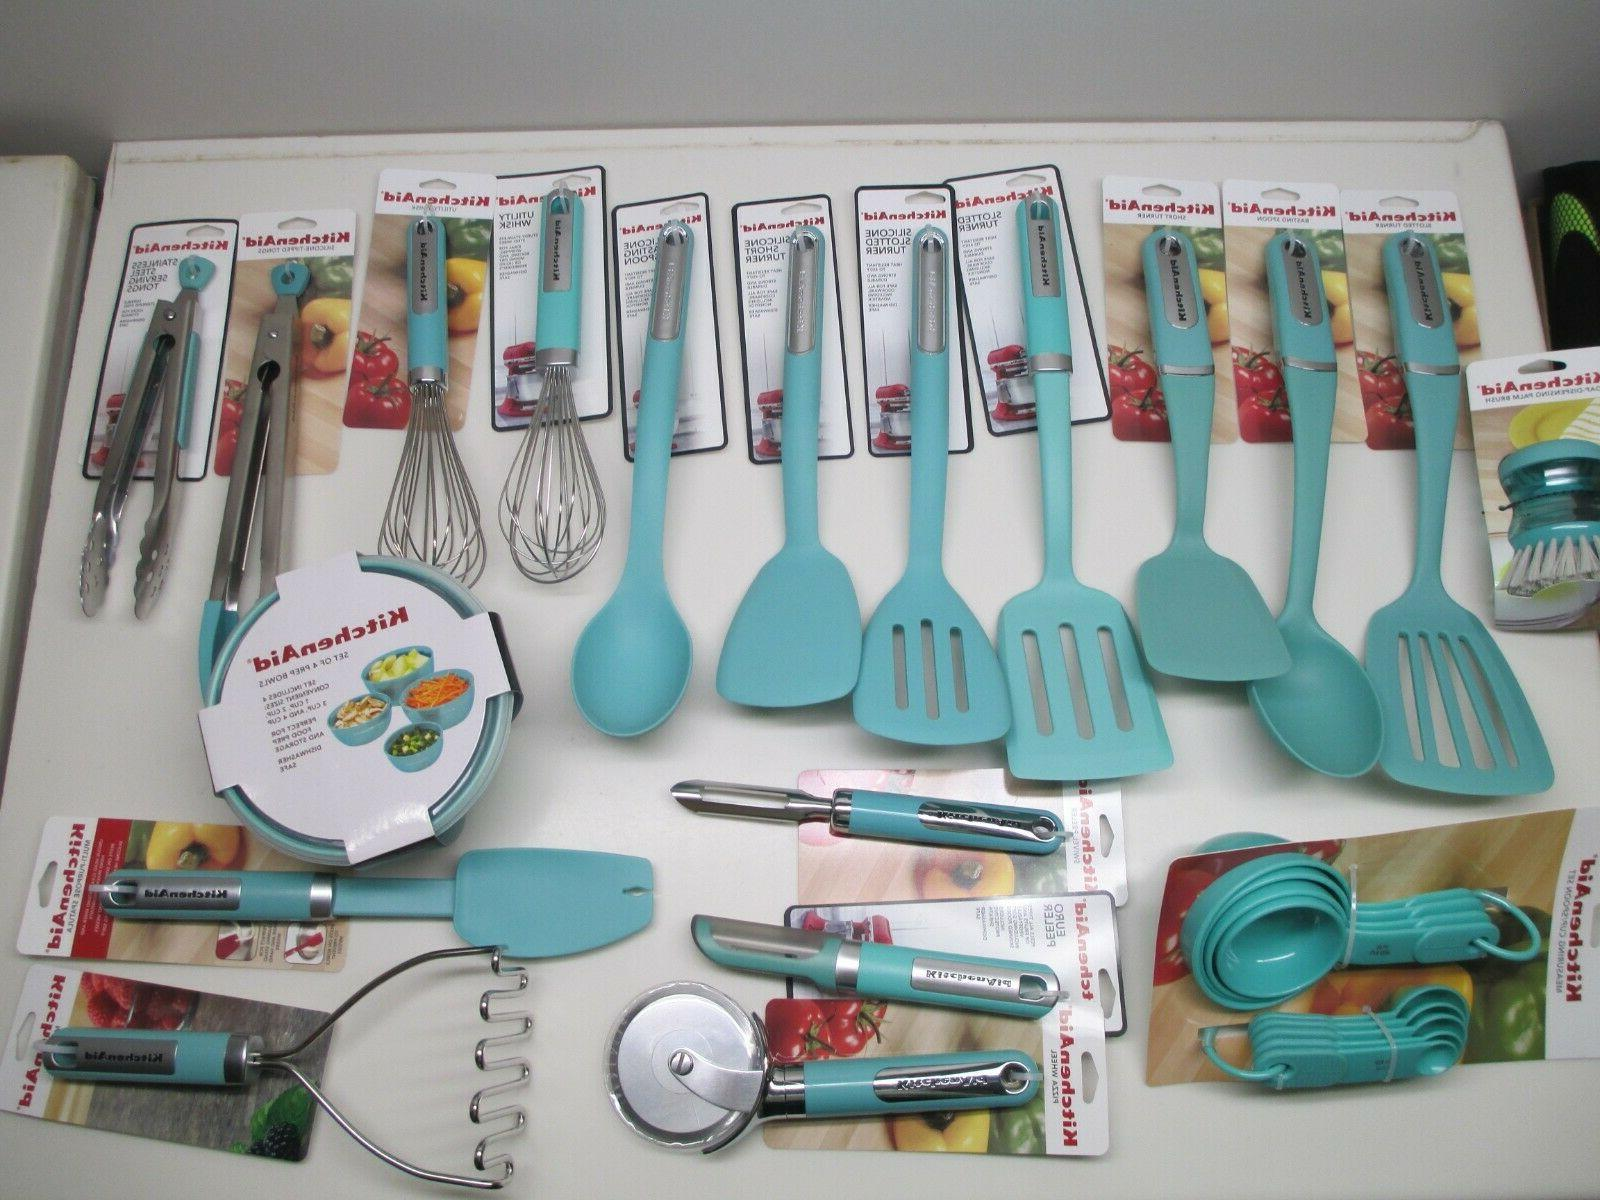 kitchen utensils and towels in aqua sky